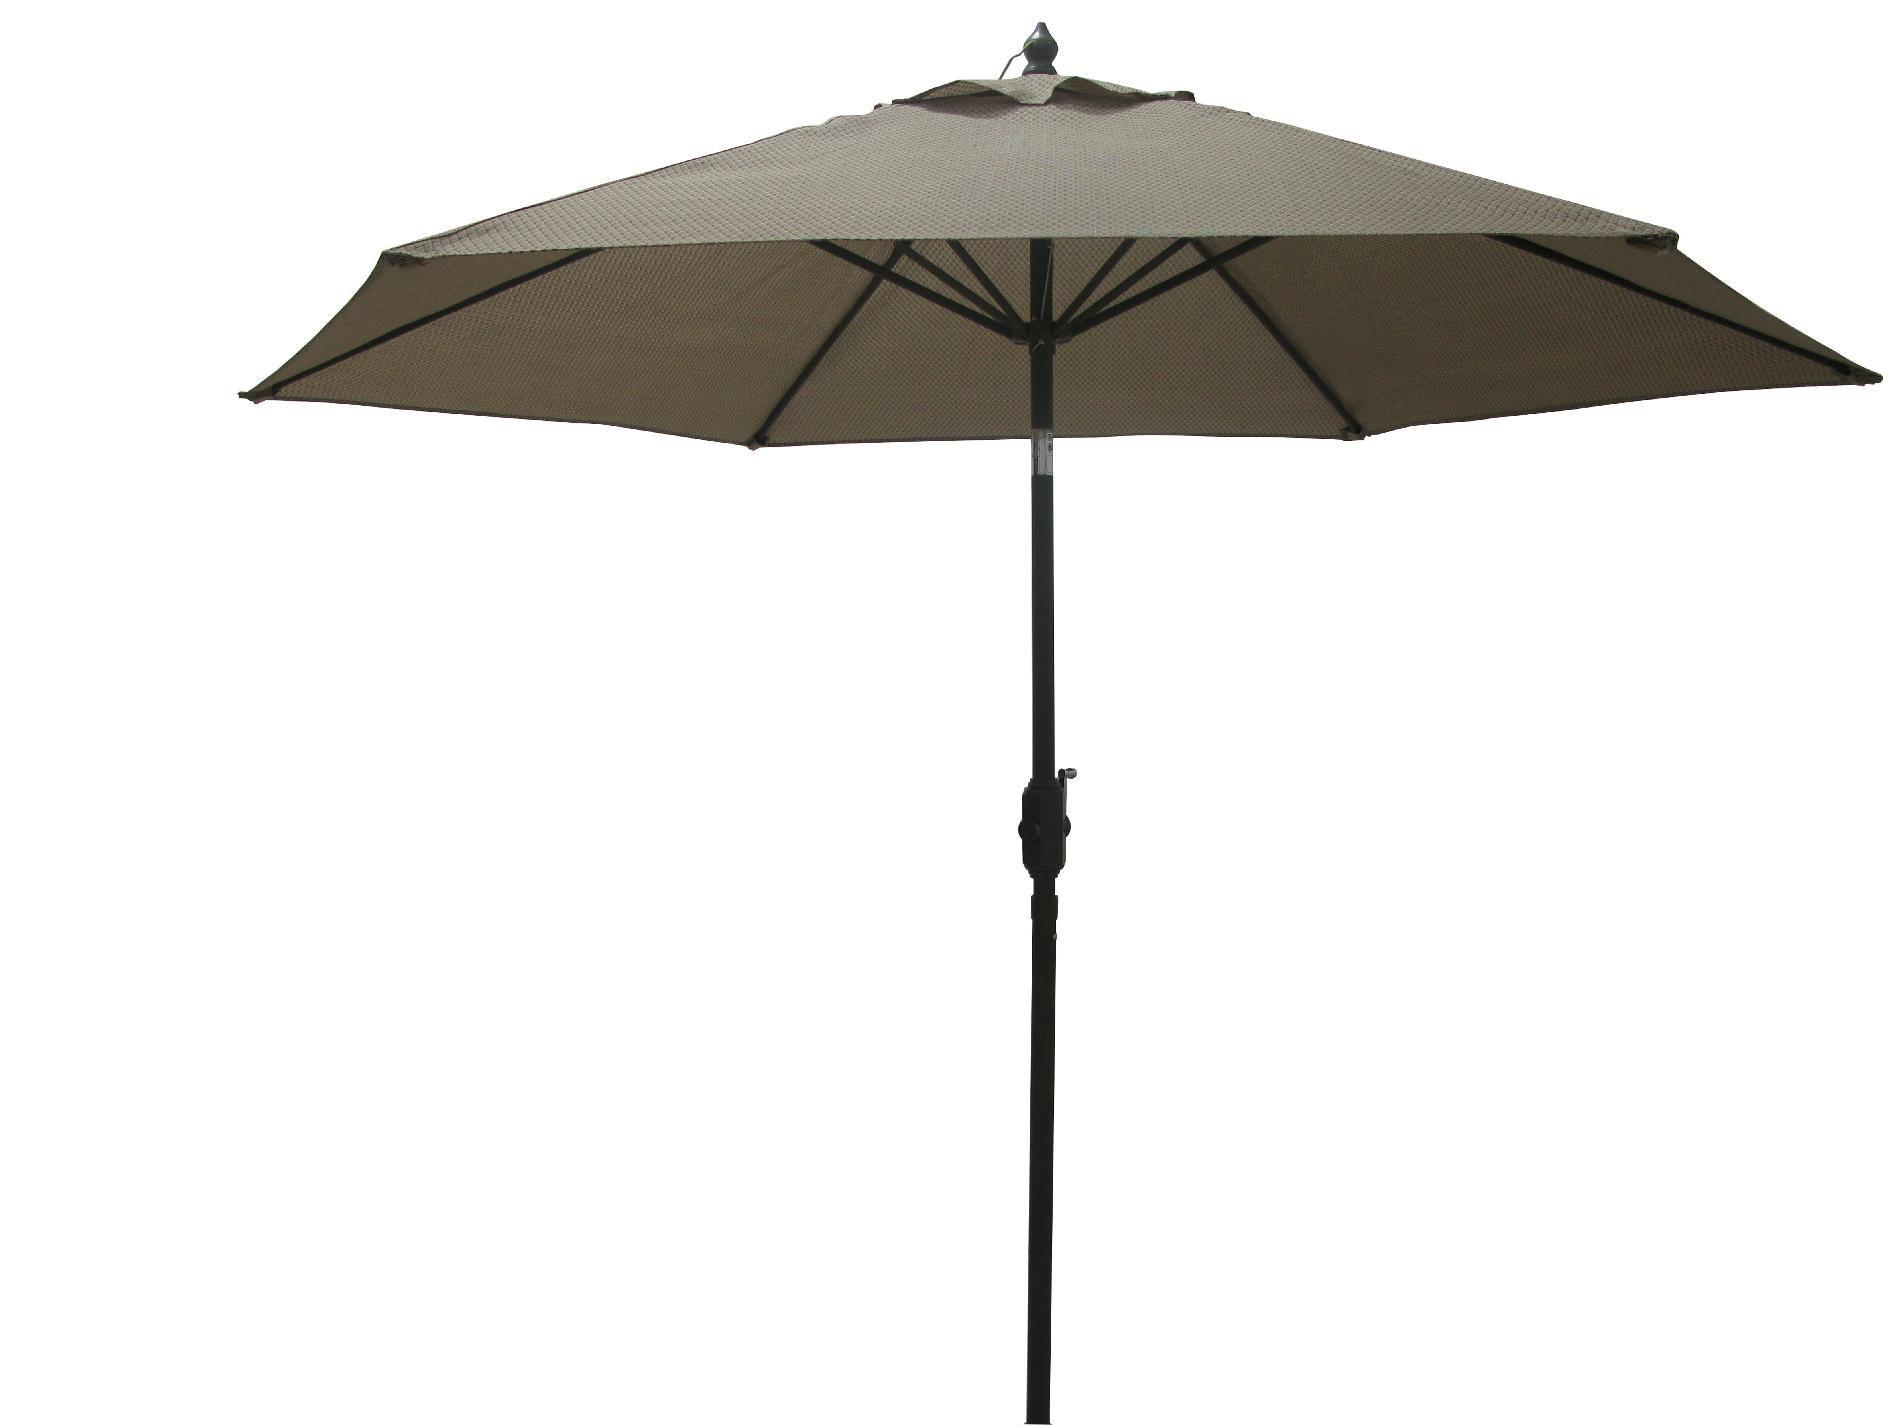 Kmart Patio Umbrella